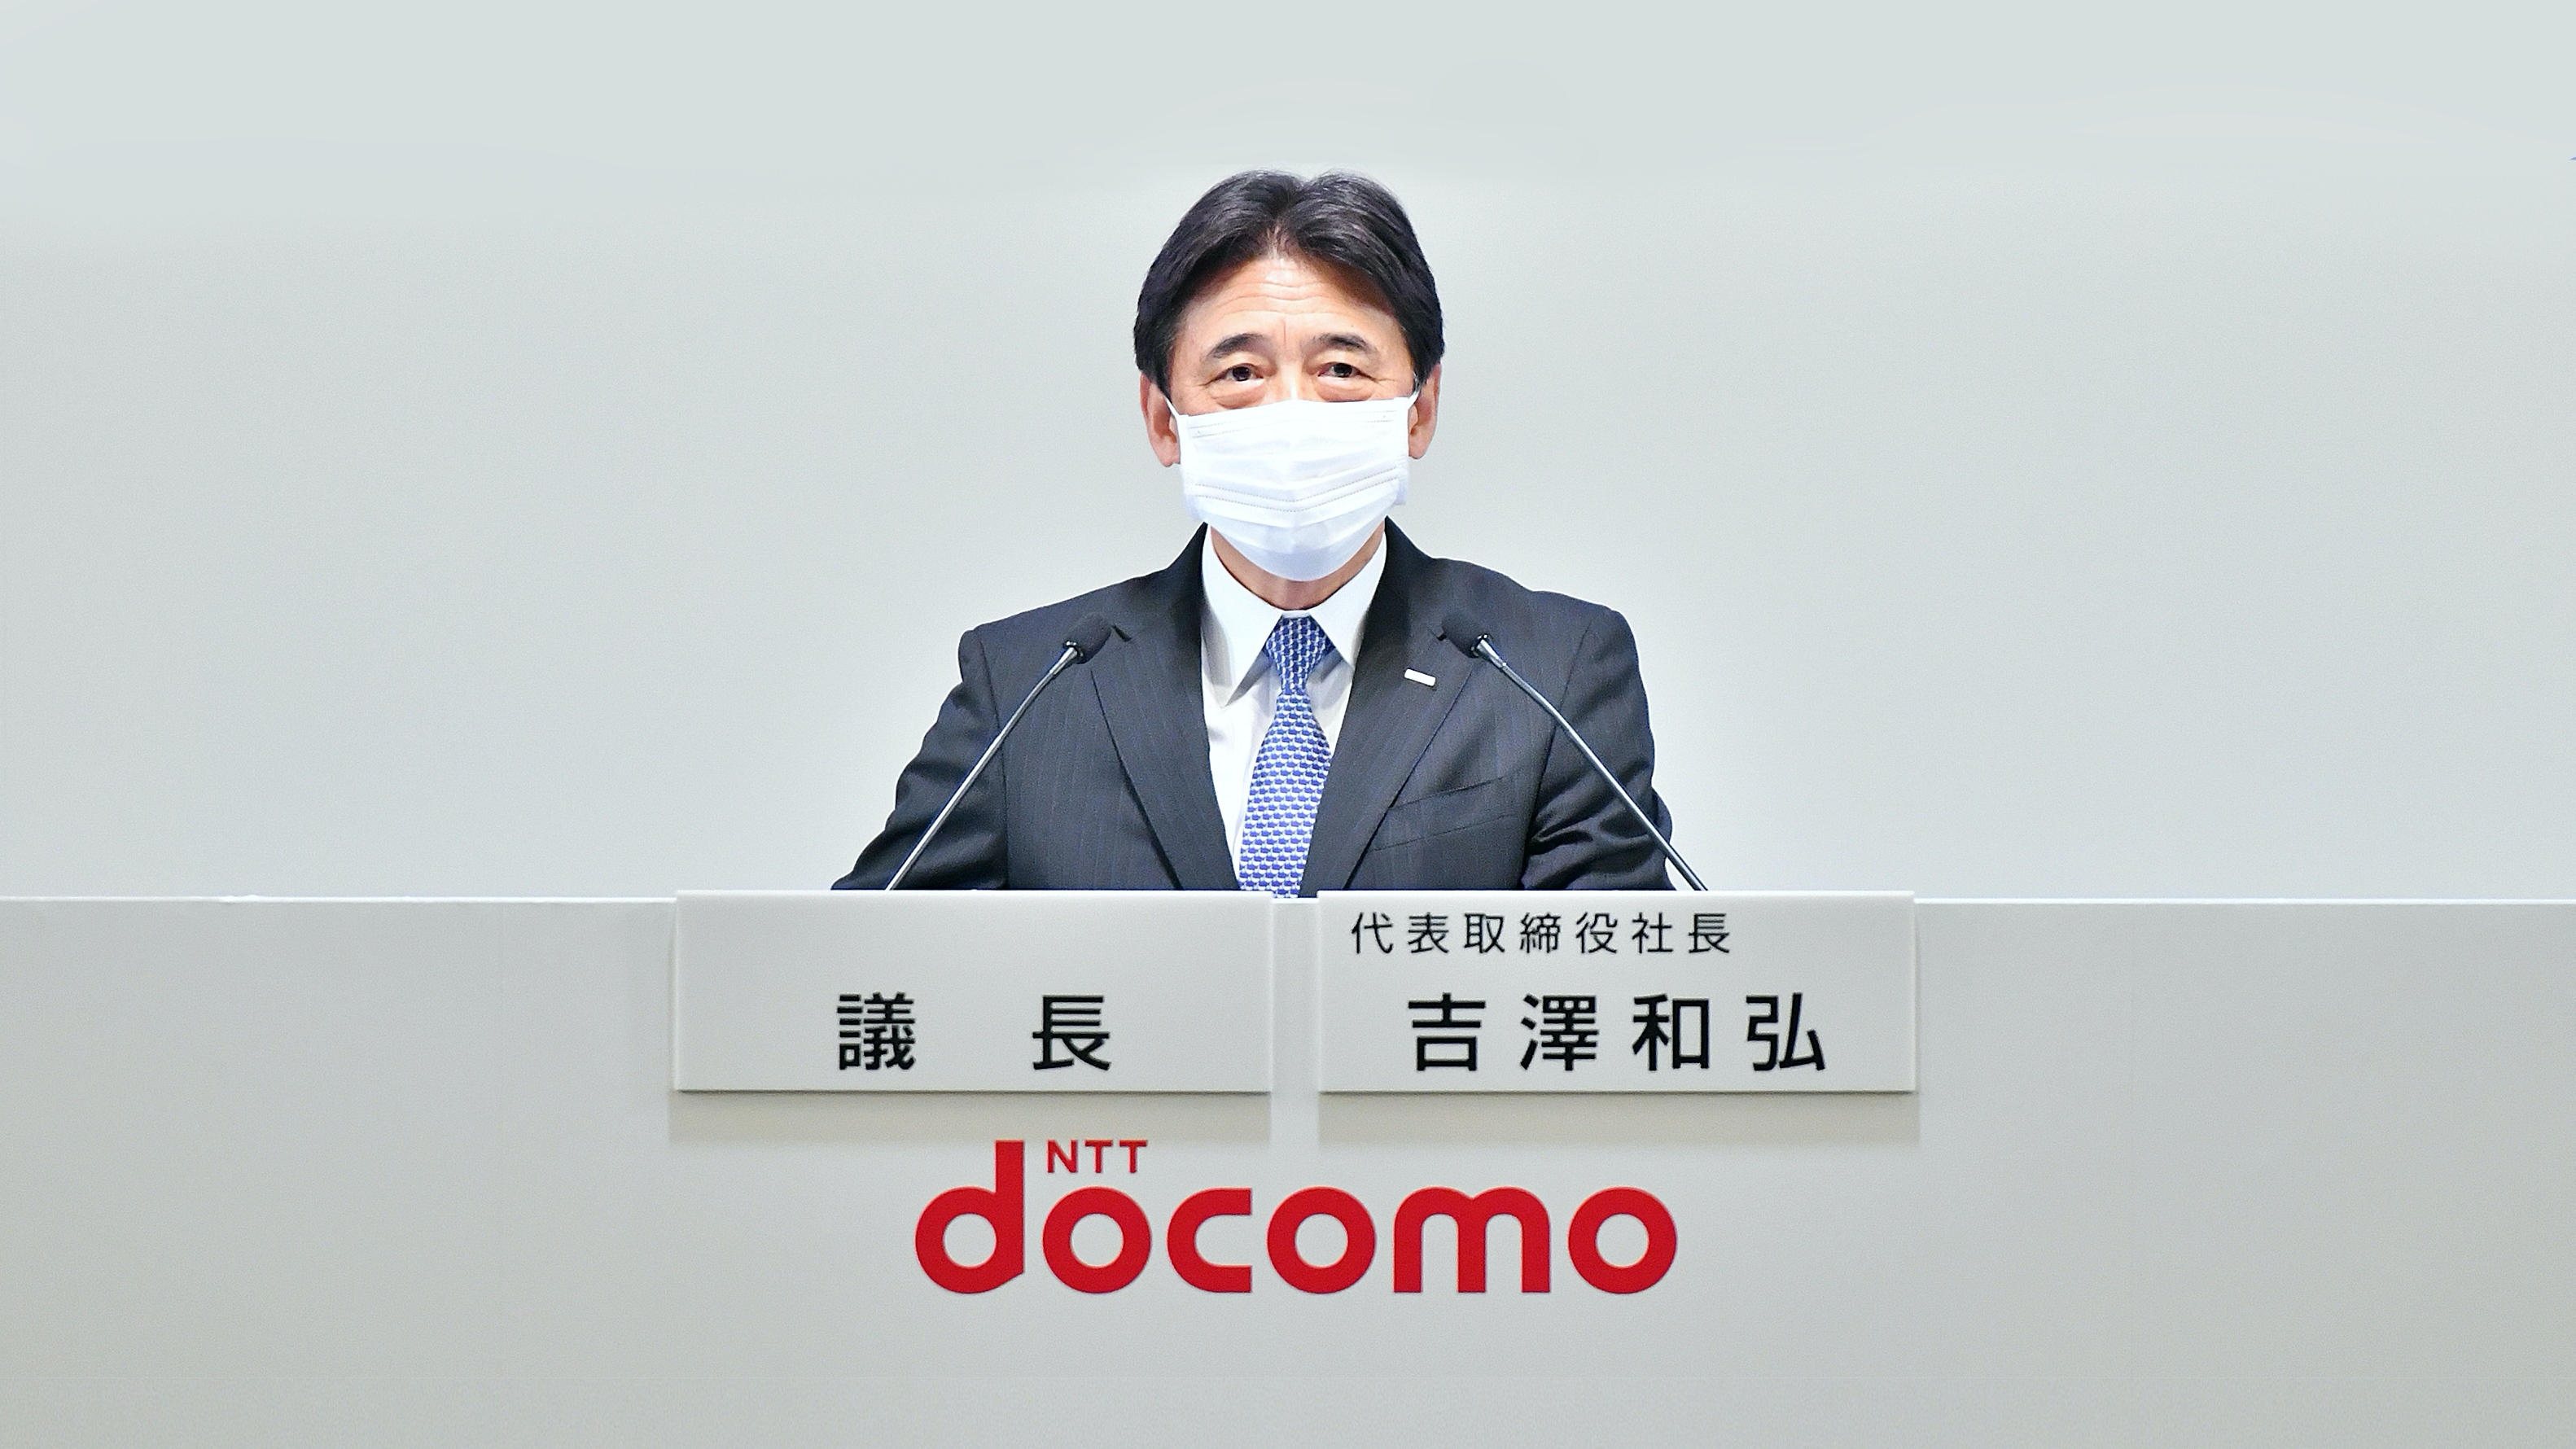 NTTドコモ、第29回定時株主総会を開催 新時代の成長に向けスタートを切る